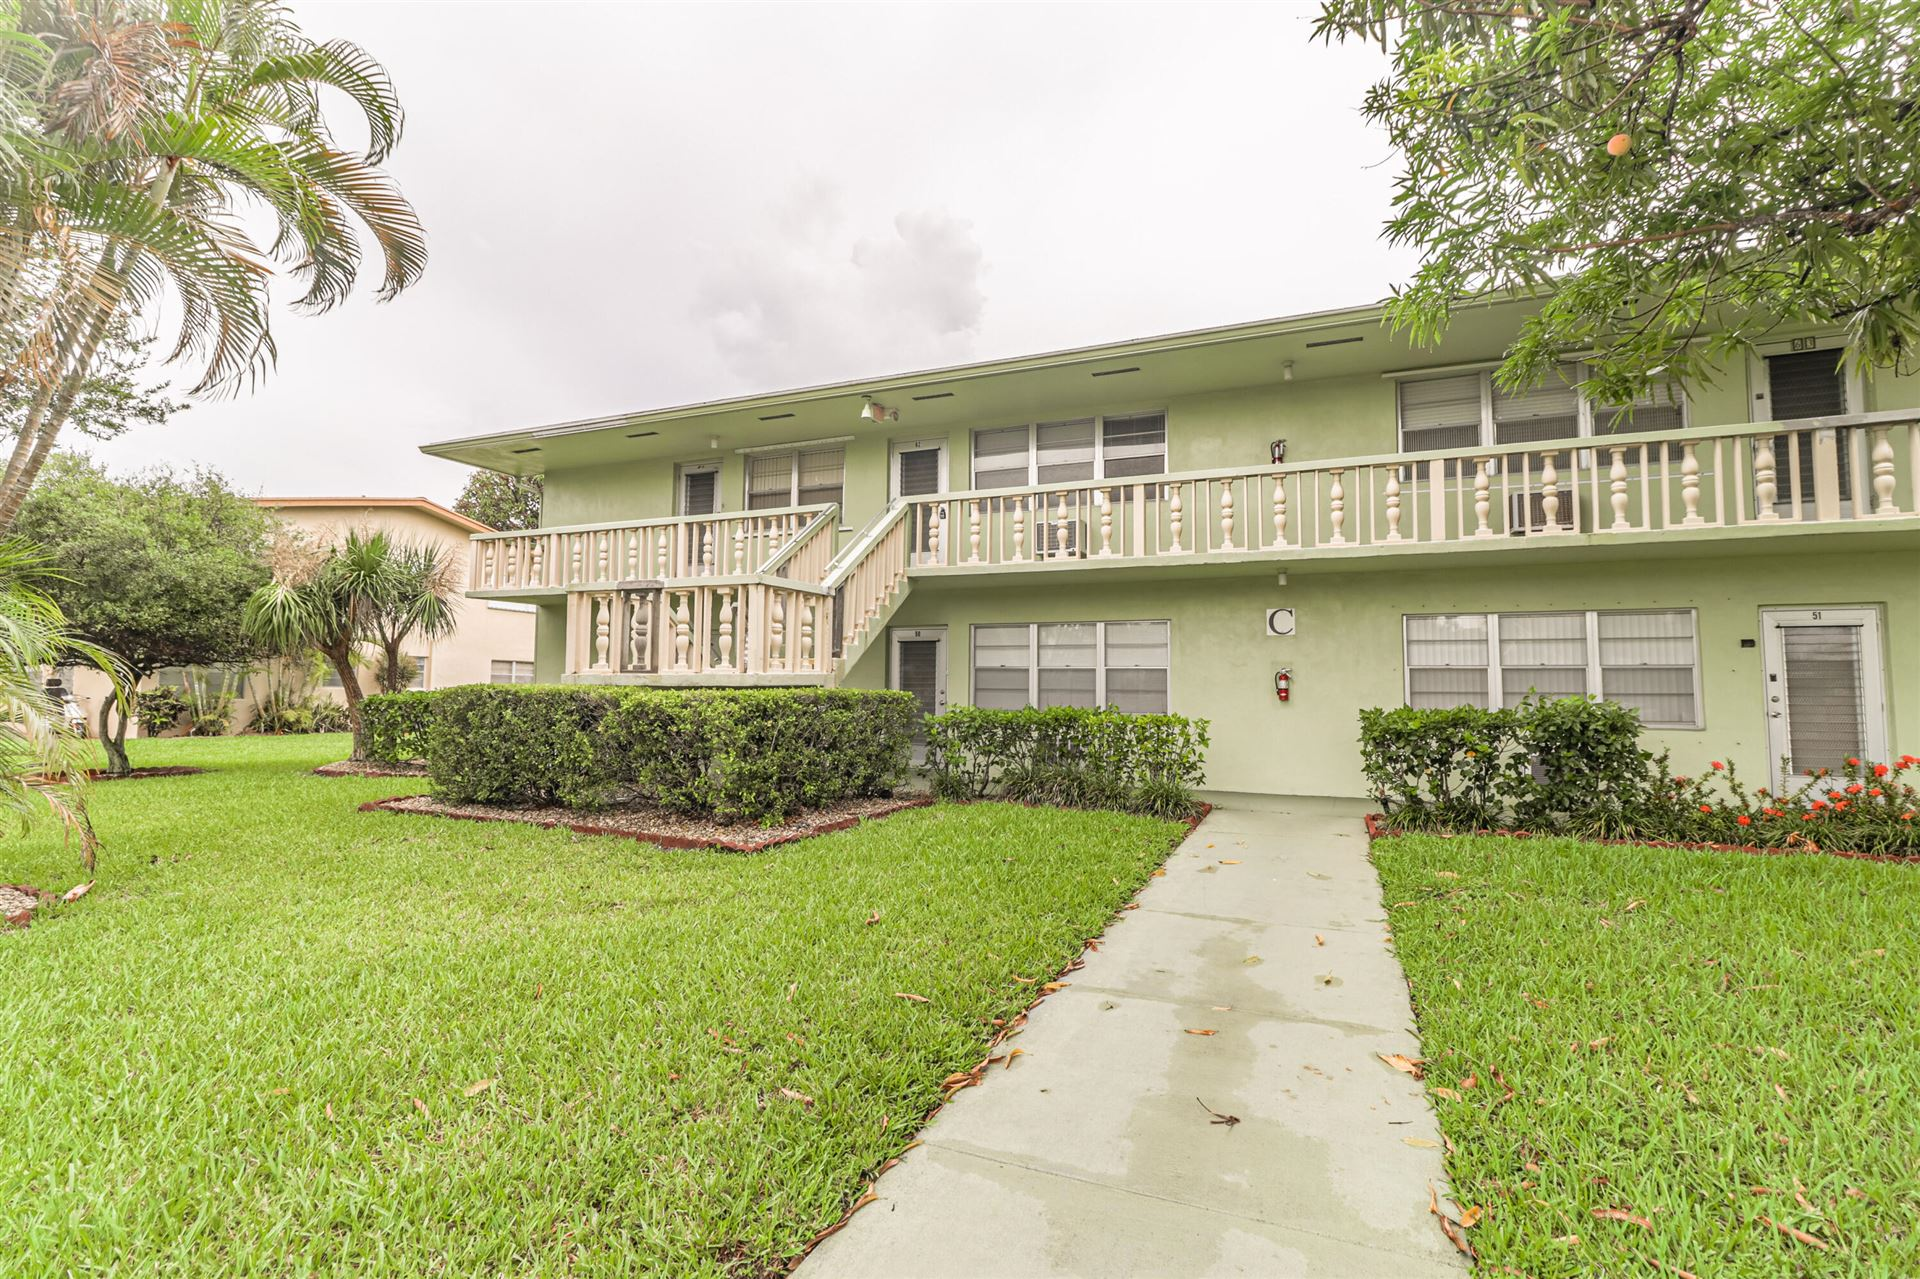 62 Norwich C, West Palm Beach, FL 33417 - MLS#: RX-10747330